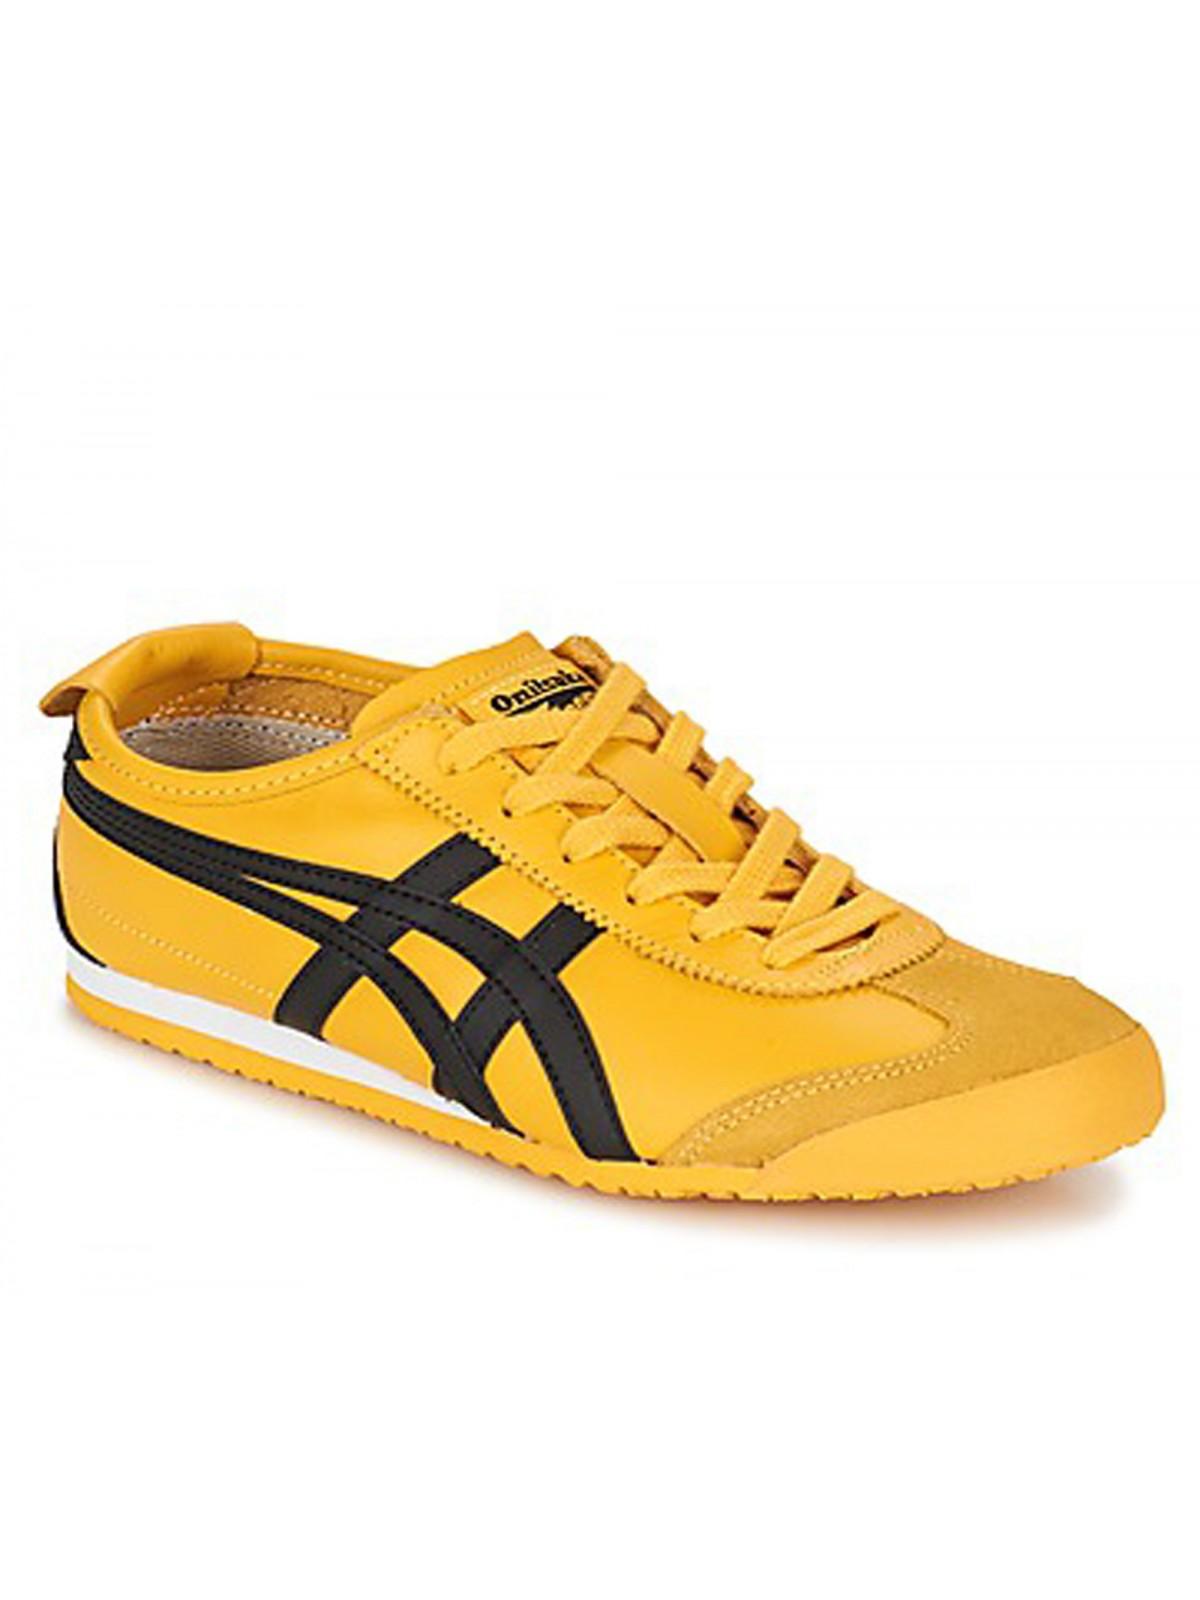 Asics Mexico 66 jaune